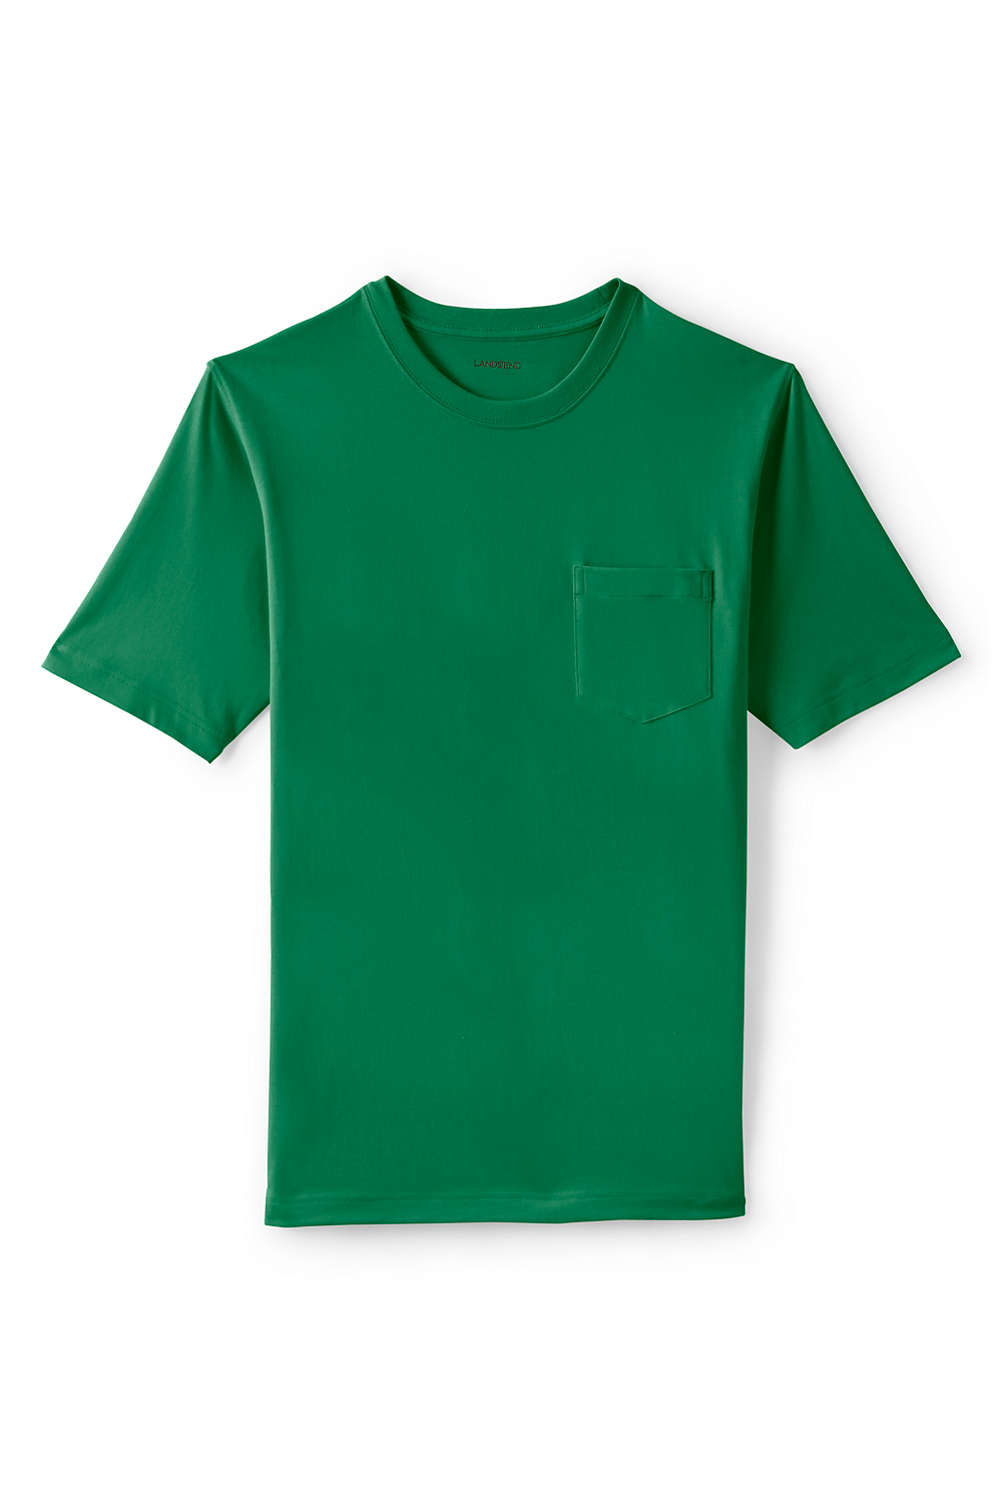 b7353c7b87b Men's Super-T Short Sleeve T-Shirt with Pocket